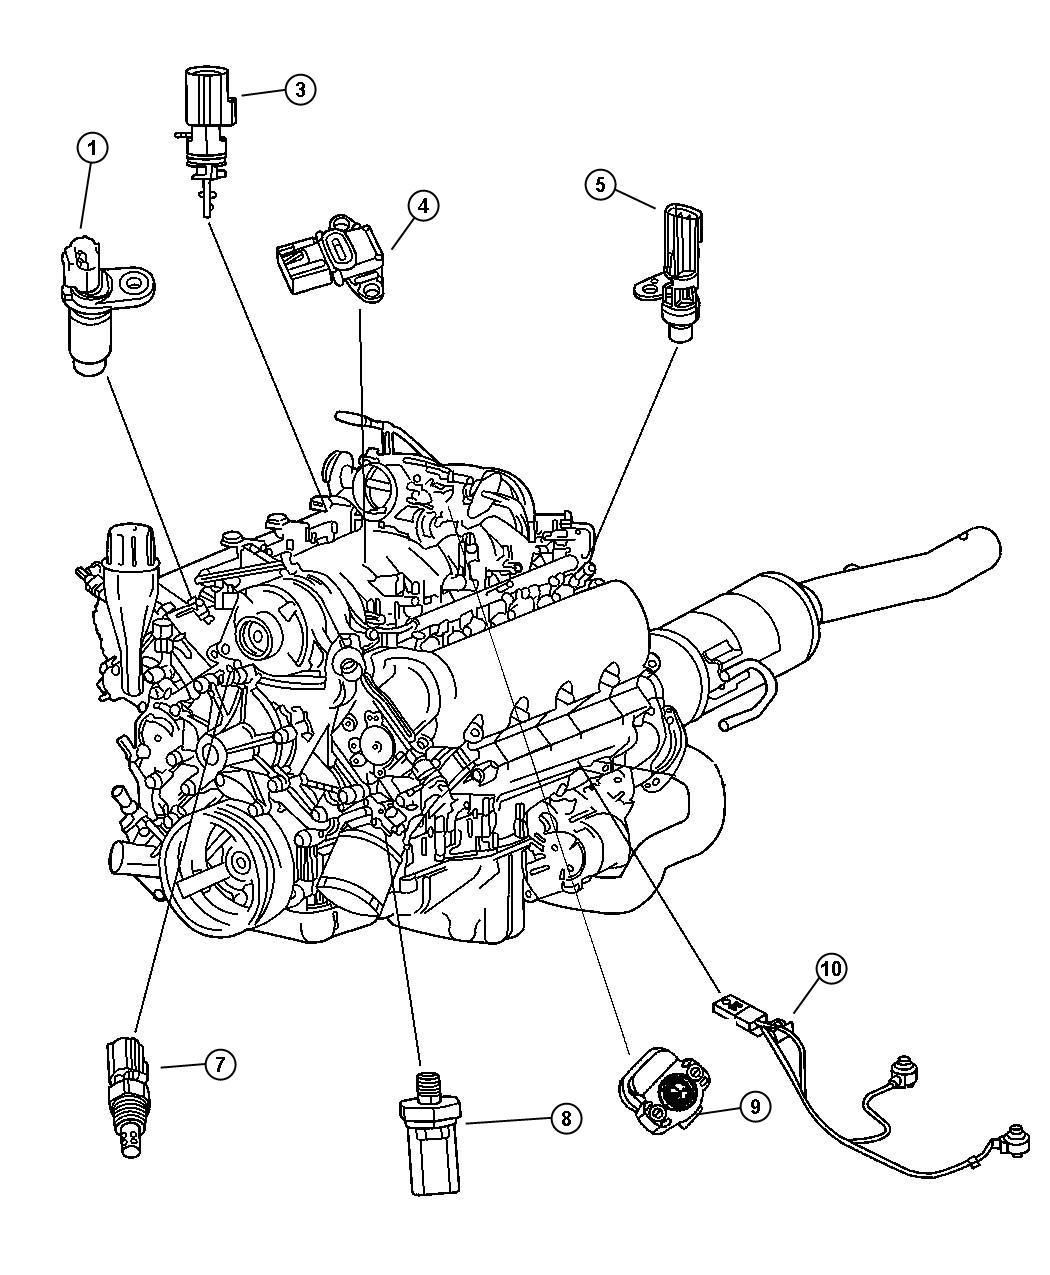 i2199579  L Engine Diagram Sensor on crankshaft position sensor diagram, 3.1l v6 engine, 3.1l turbo, gm 3800 v6 parts diagram, 3.4 v6 vacuum diagram, cruise control diagram, 3.1l motor series 2, pontiac 2001 3 1 diagram, a/c diagram, 3 1 motor diagram, automatic transmission diagram,